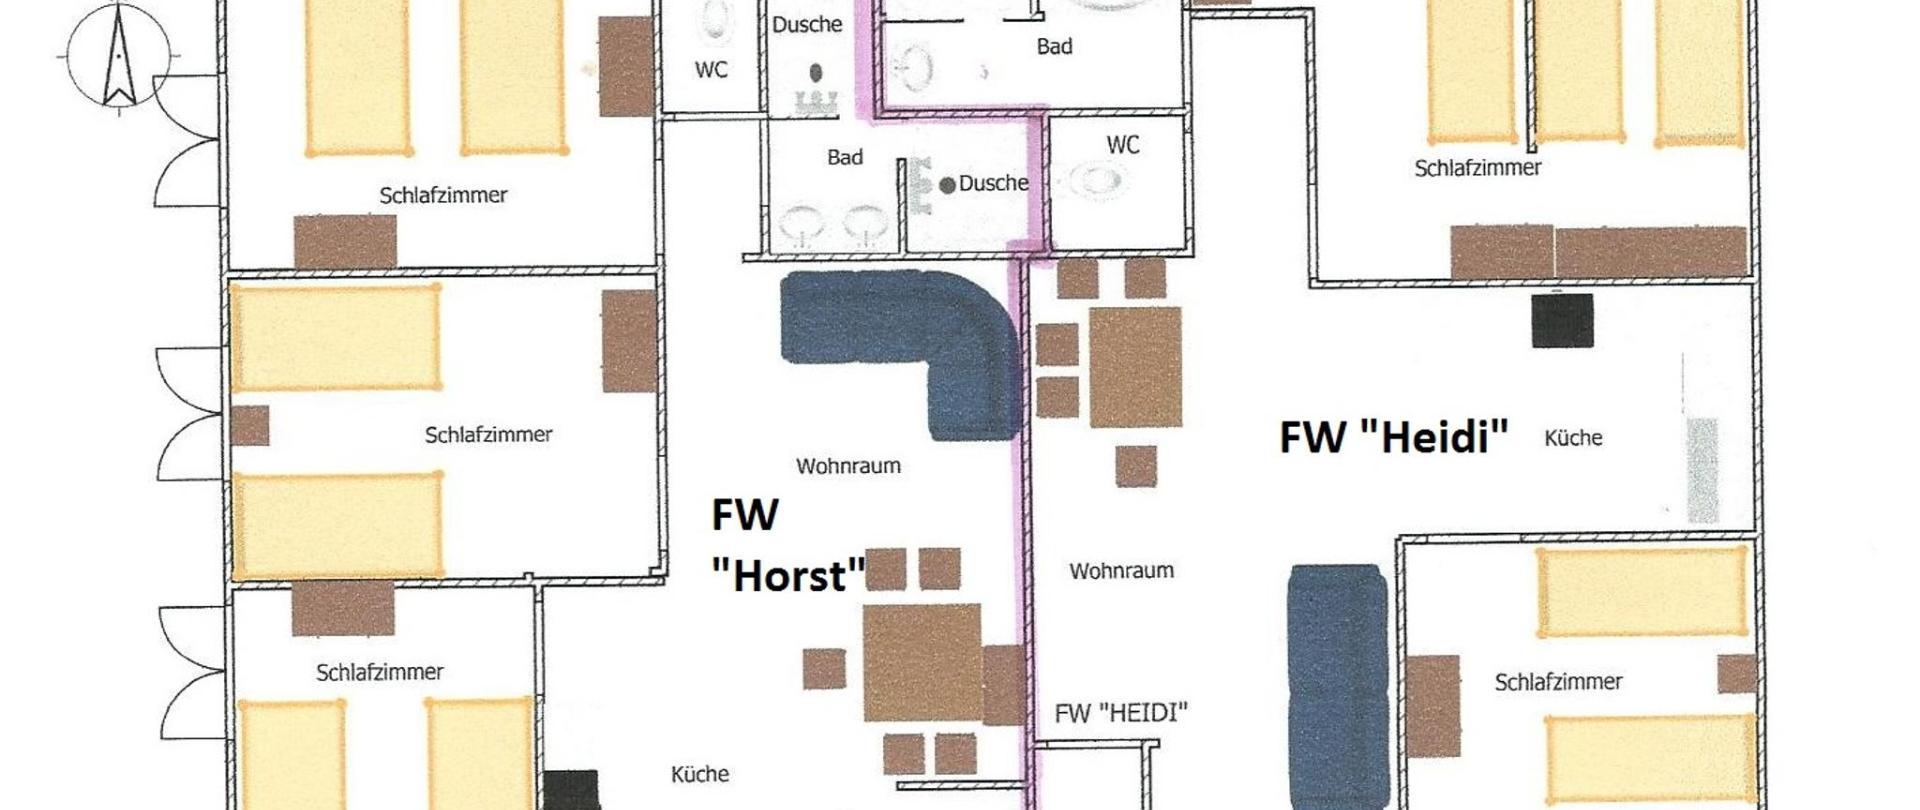 Apartment Grillstube